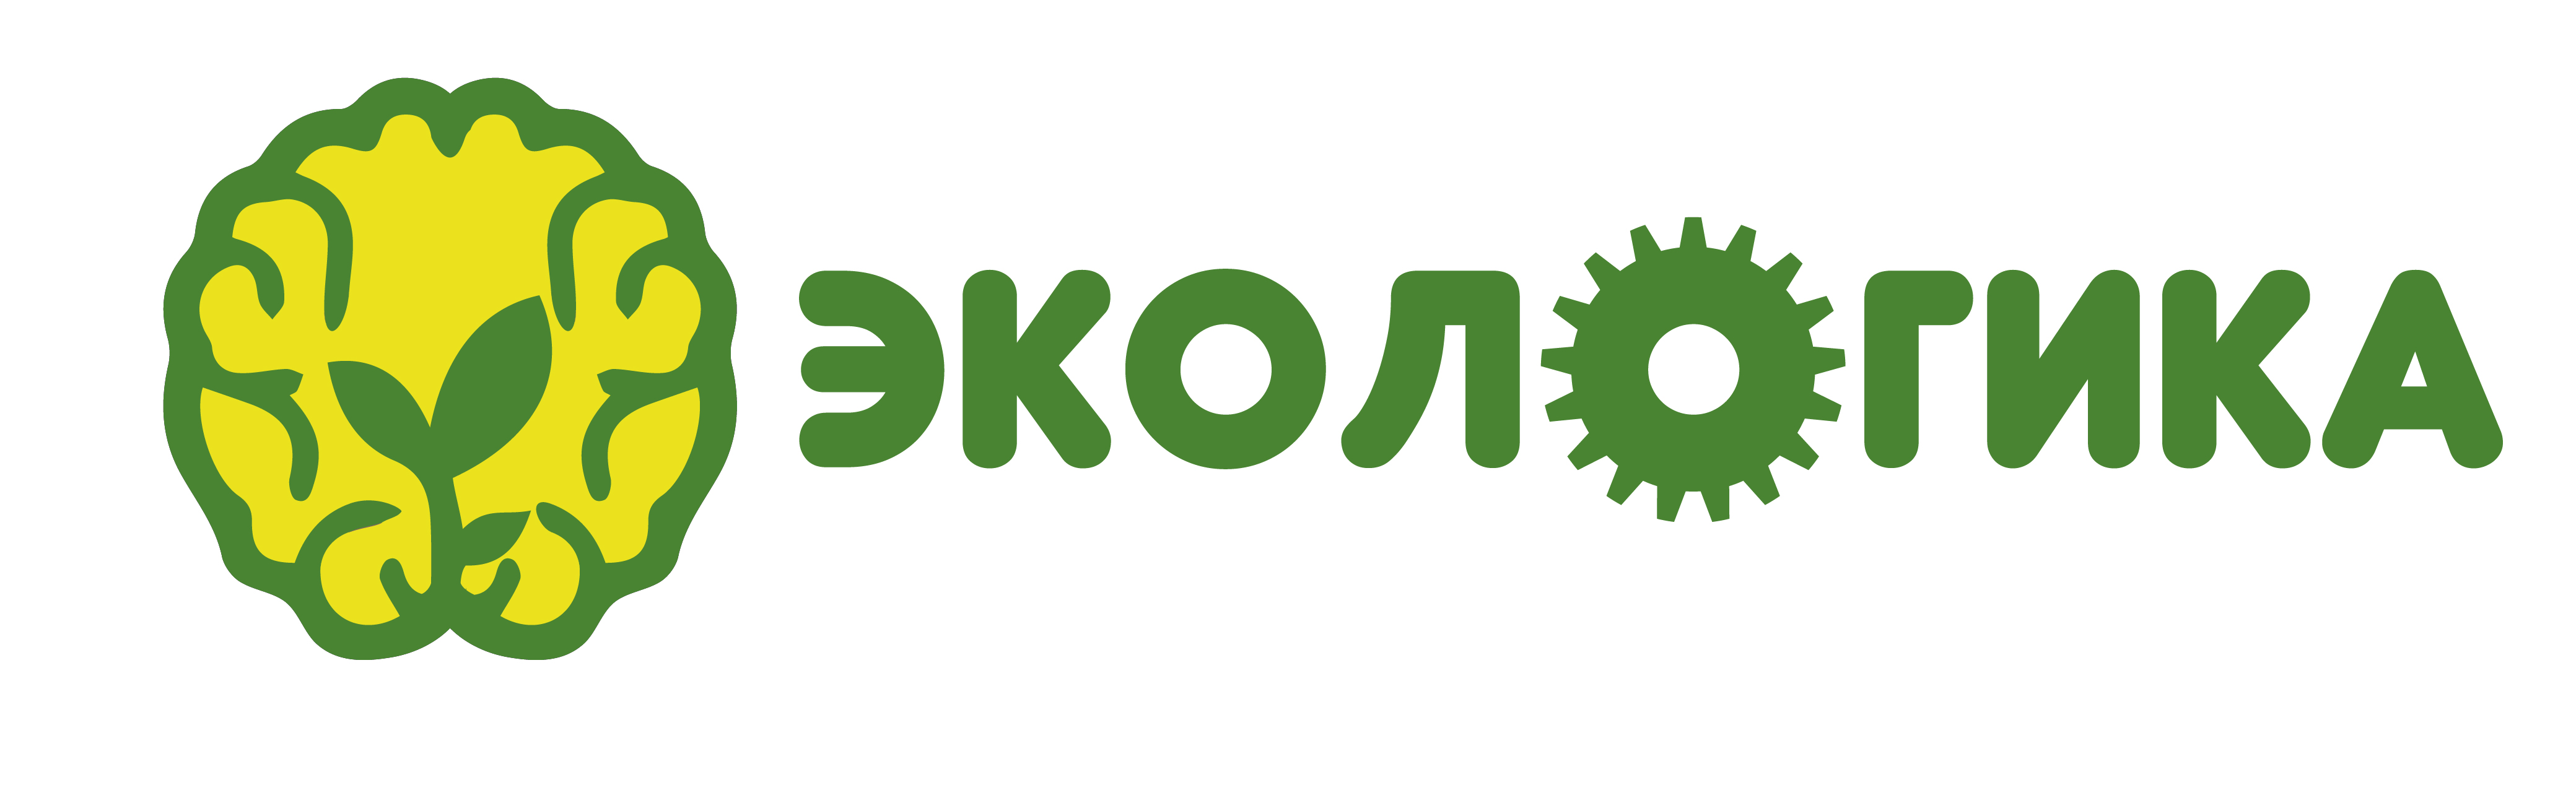 Логотип ЭКОЛОГИКА фото f_6235941545ad3c83.jpg